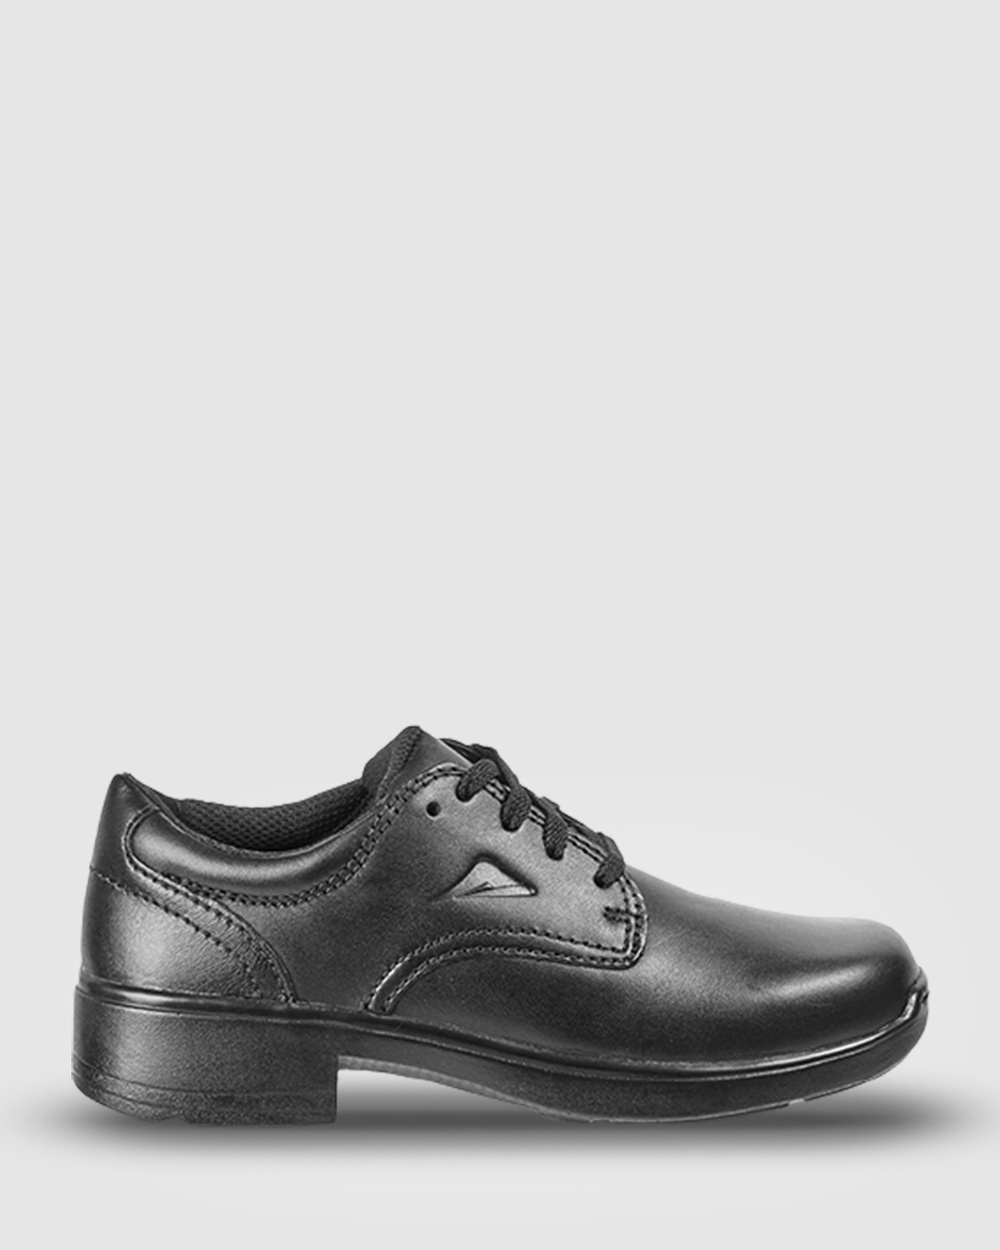 Ascent Adiva 2 B Width School Shoes Black Australia